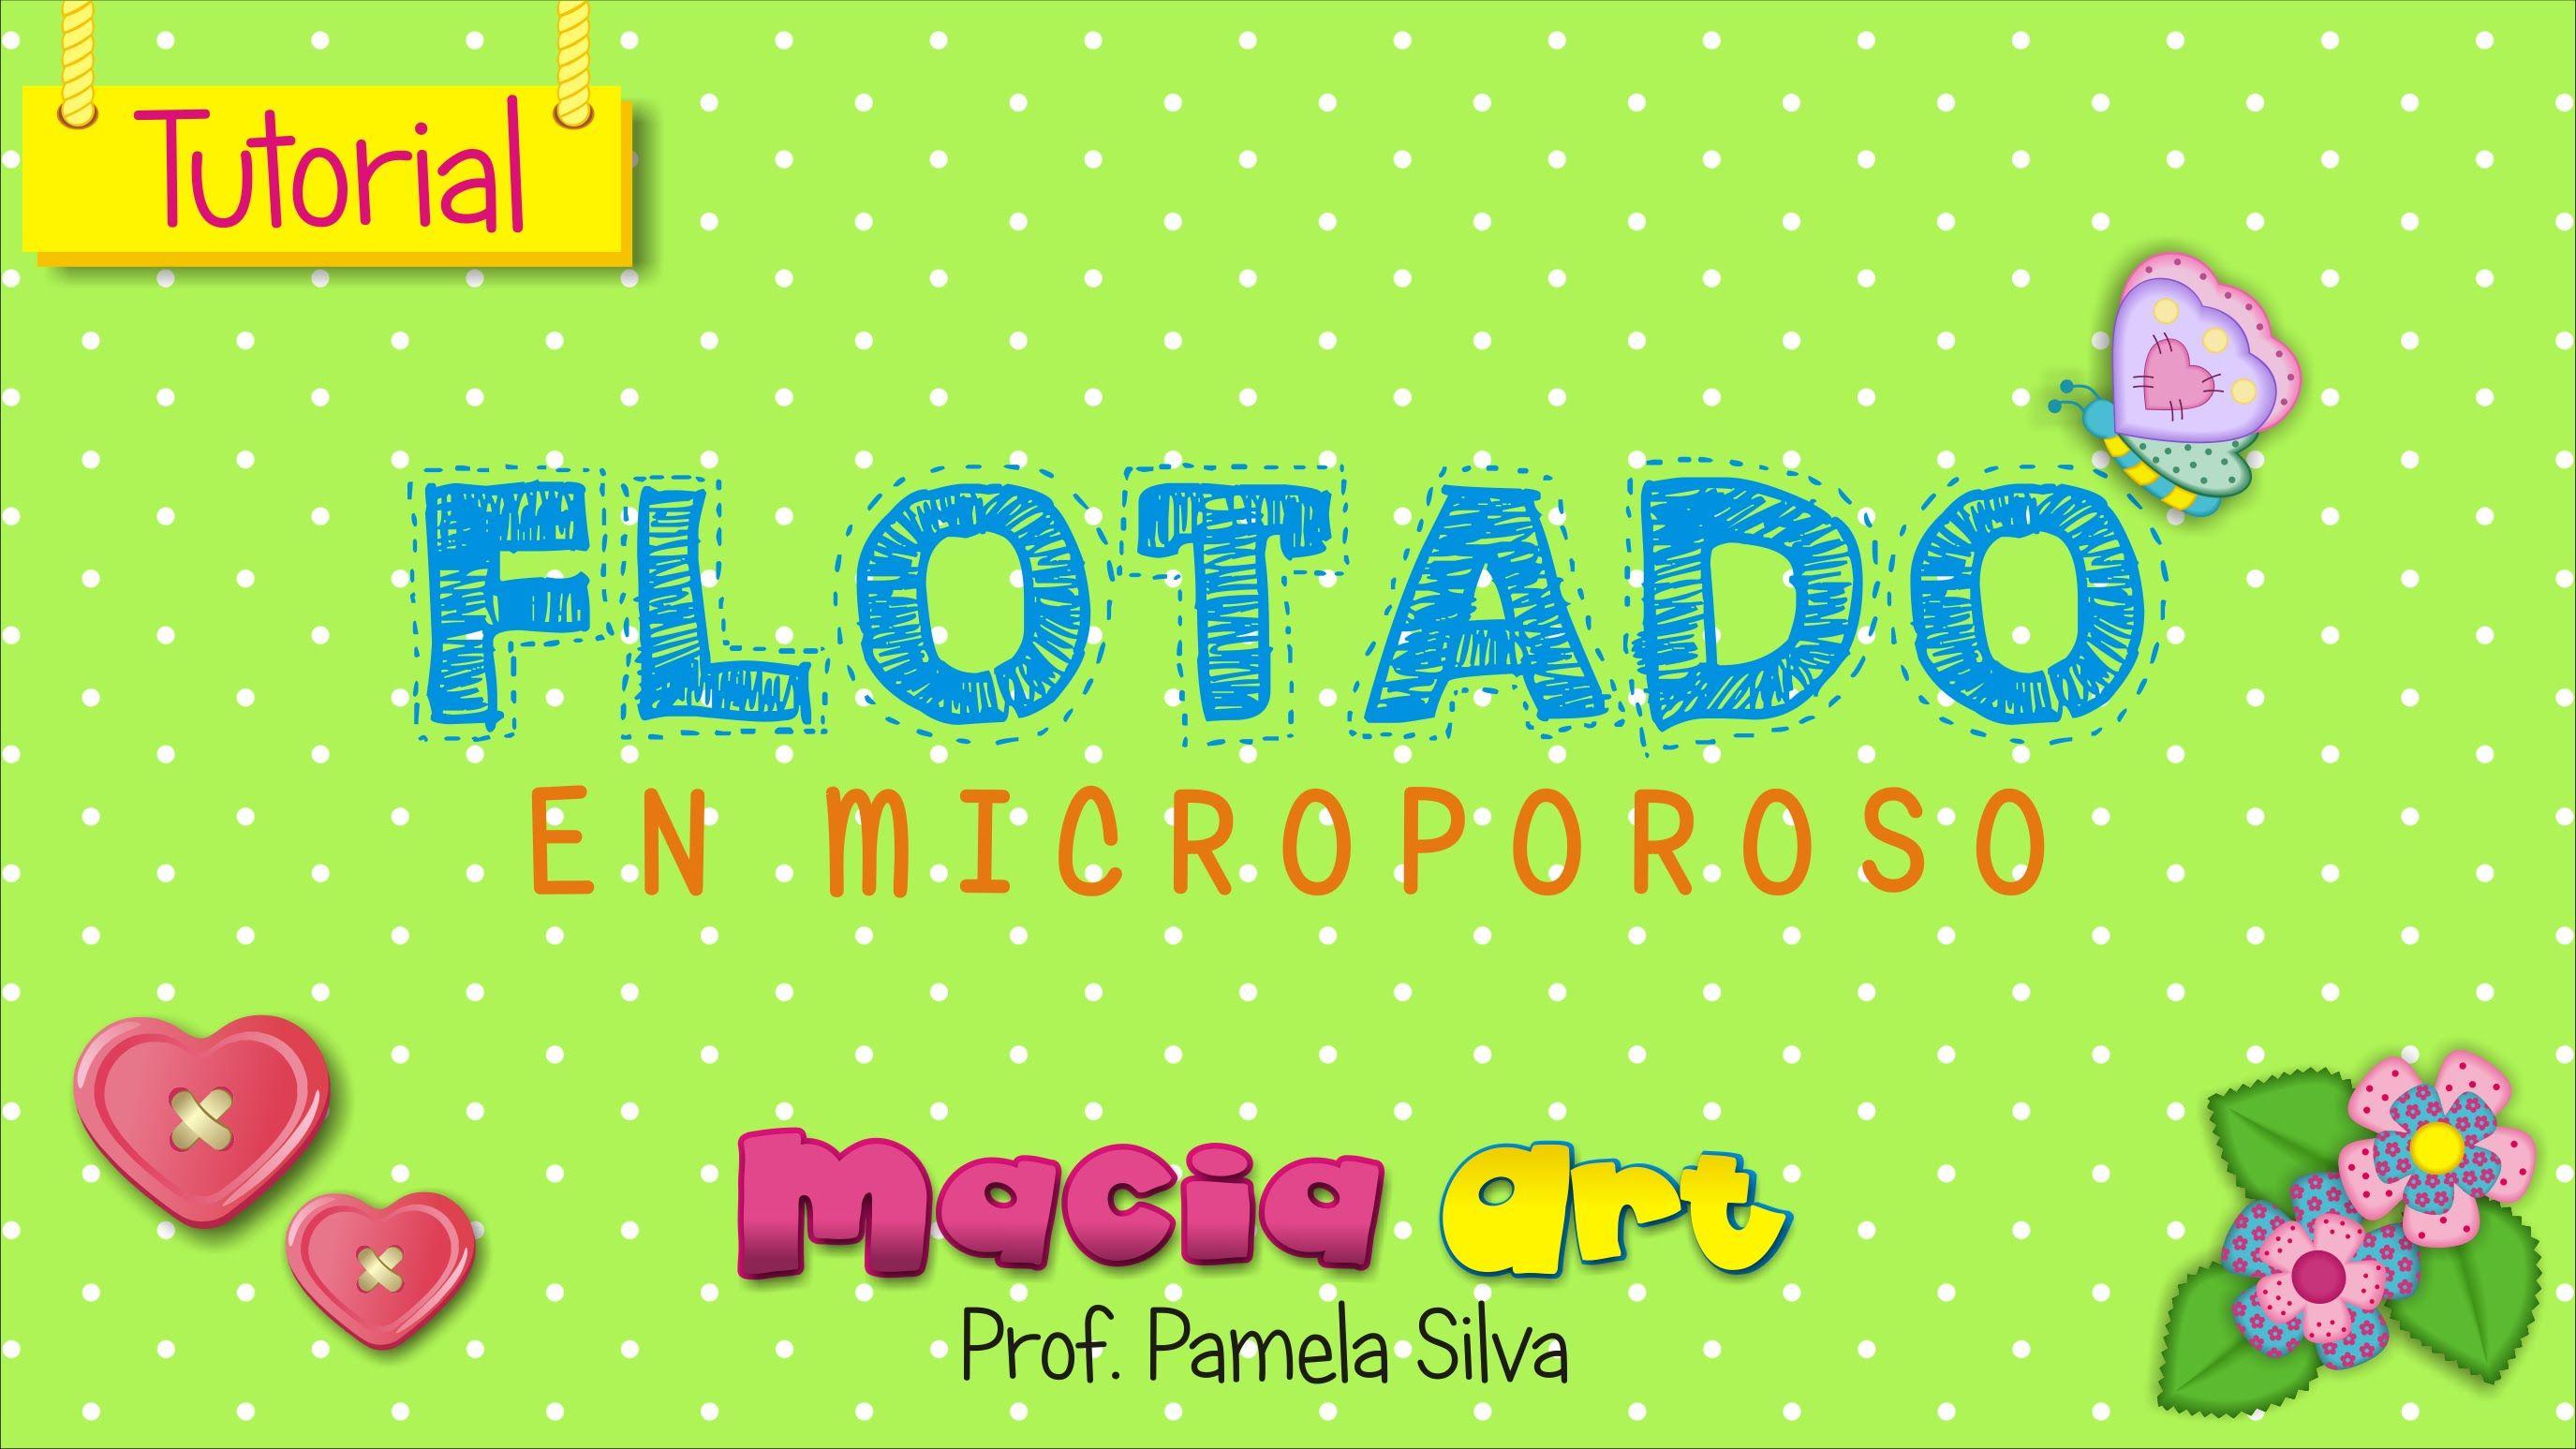 MANUALIDADES EN FOAMI - TÉCNICA DEL FLOTADO (MICROPOROSO / GOMA EVA / FOMY)